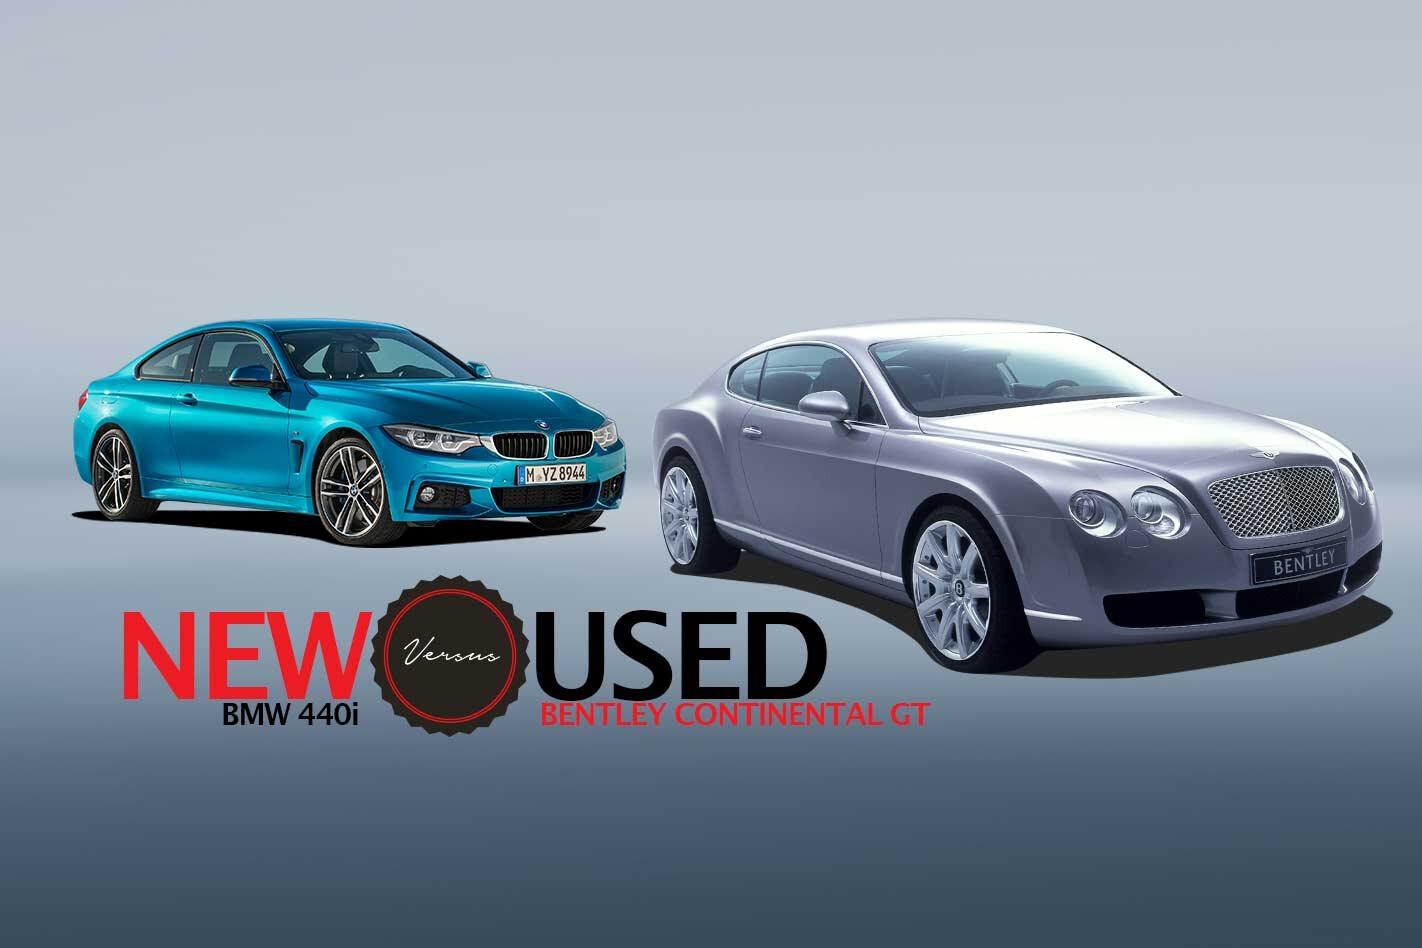 2019 BMW 440i vs 2005 Bentley Continental GT new vs used